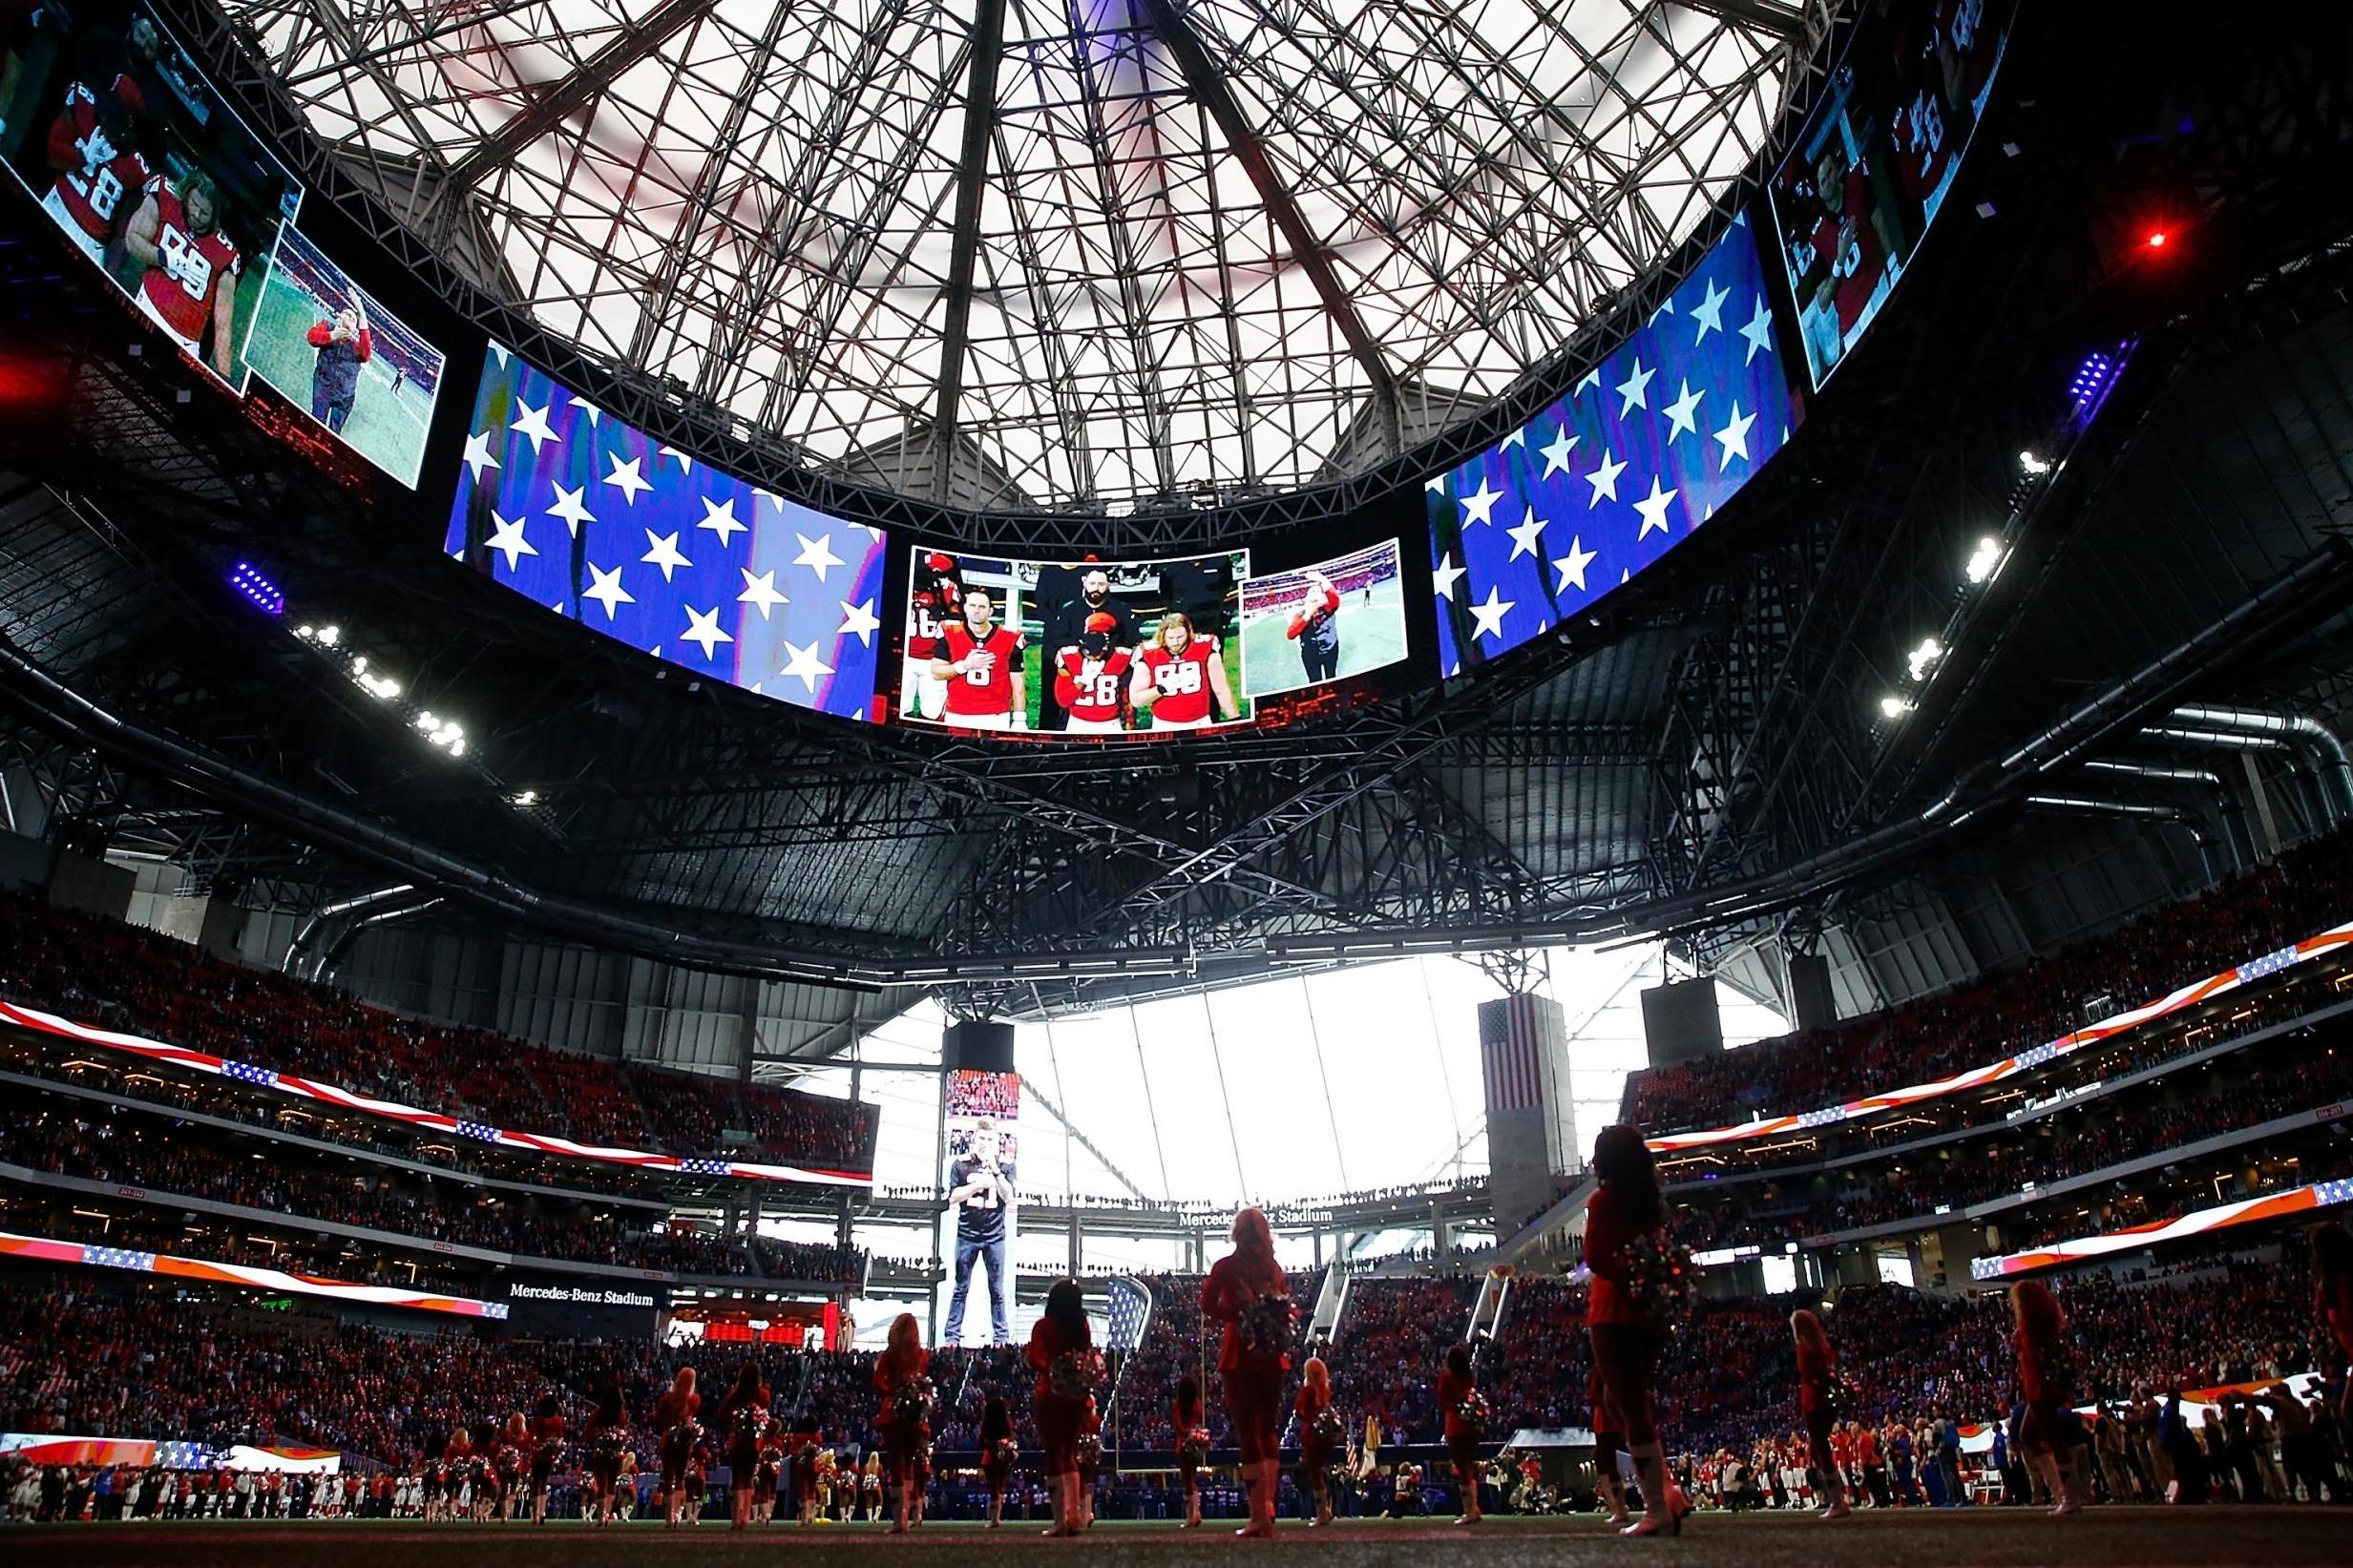 Super Bowl 2019 Attendance: La Rams Vs New England Patriots regarding Super Bowl Seating Capacity 2019